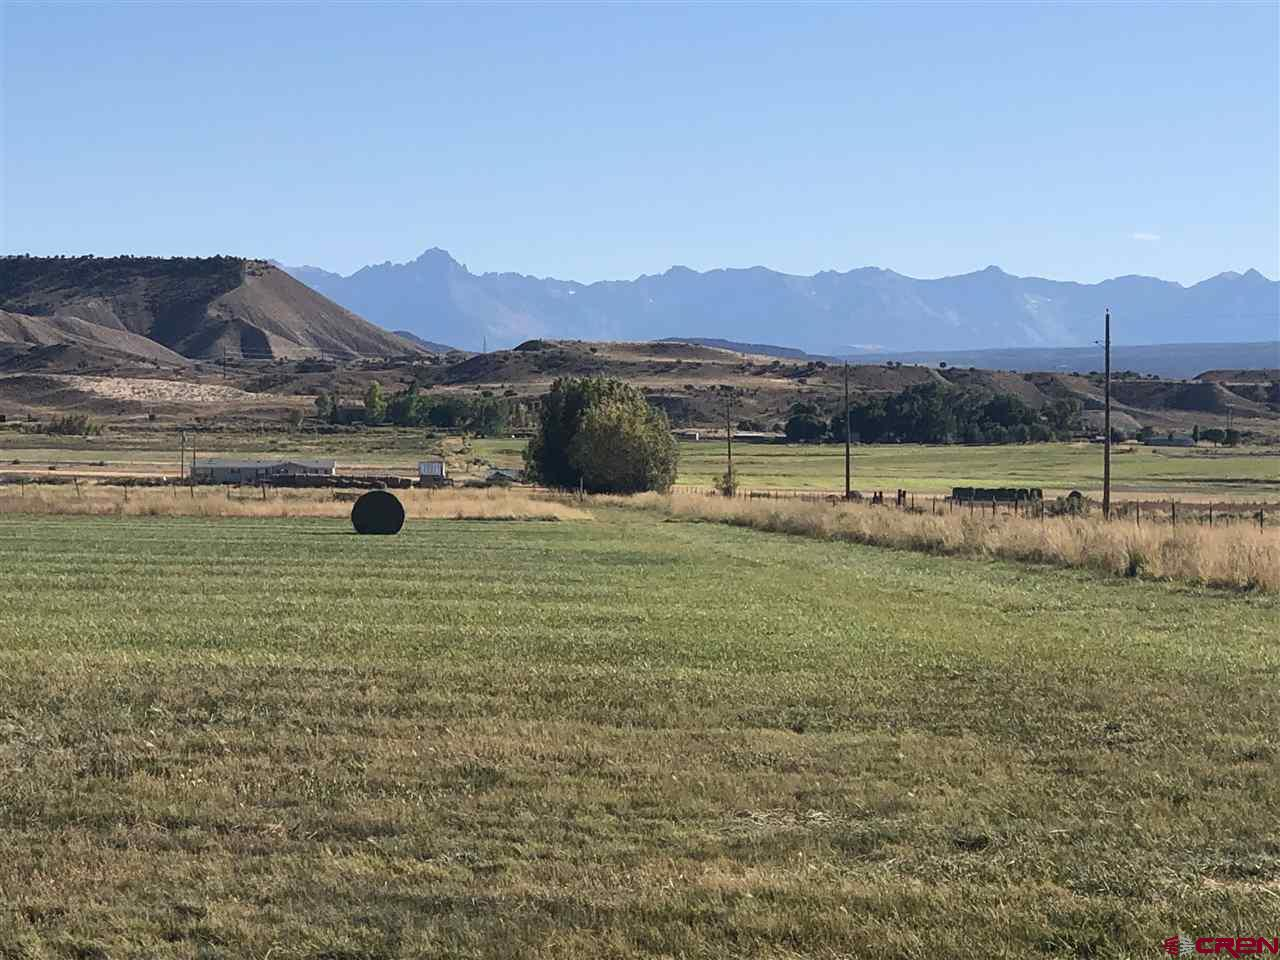 TBD Racine Road, Montrose, Colorado 81401, ,Lots And Land,For Sale,TBD Racine Road,777299